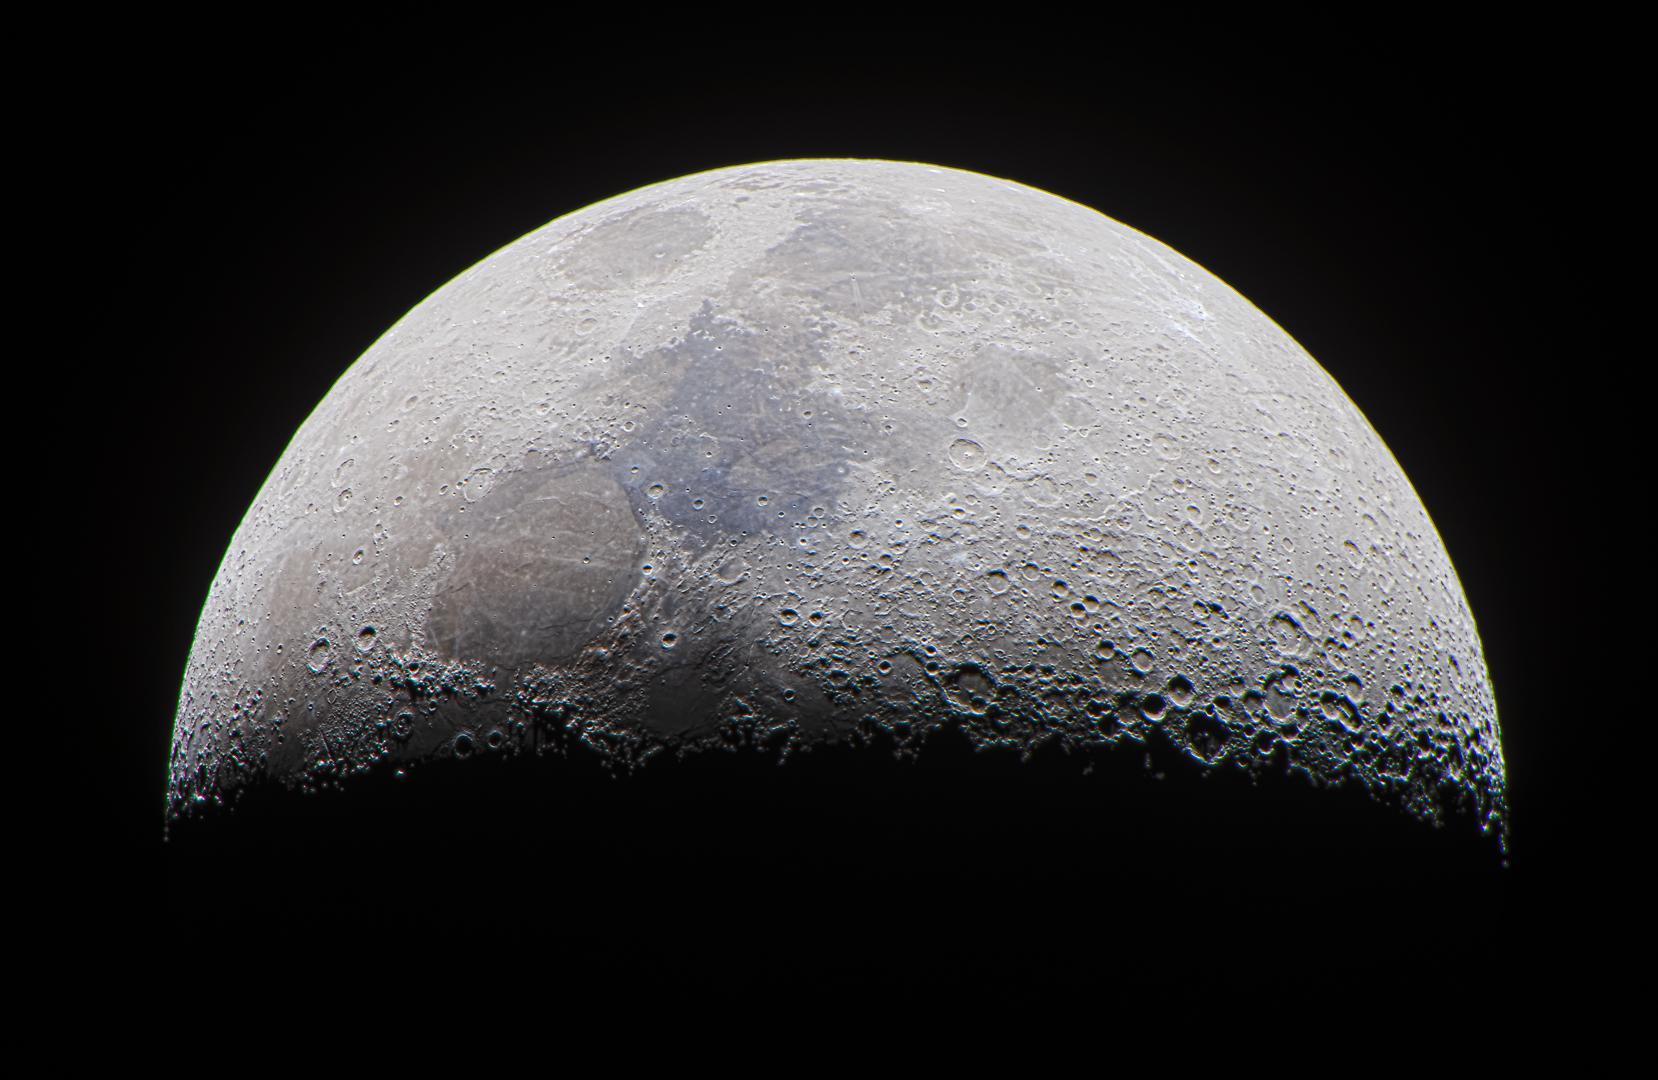 20200331 Maan_HDR-3